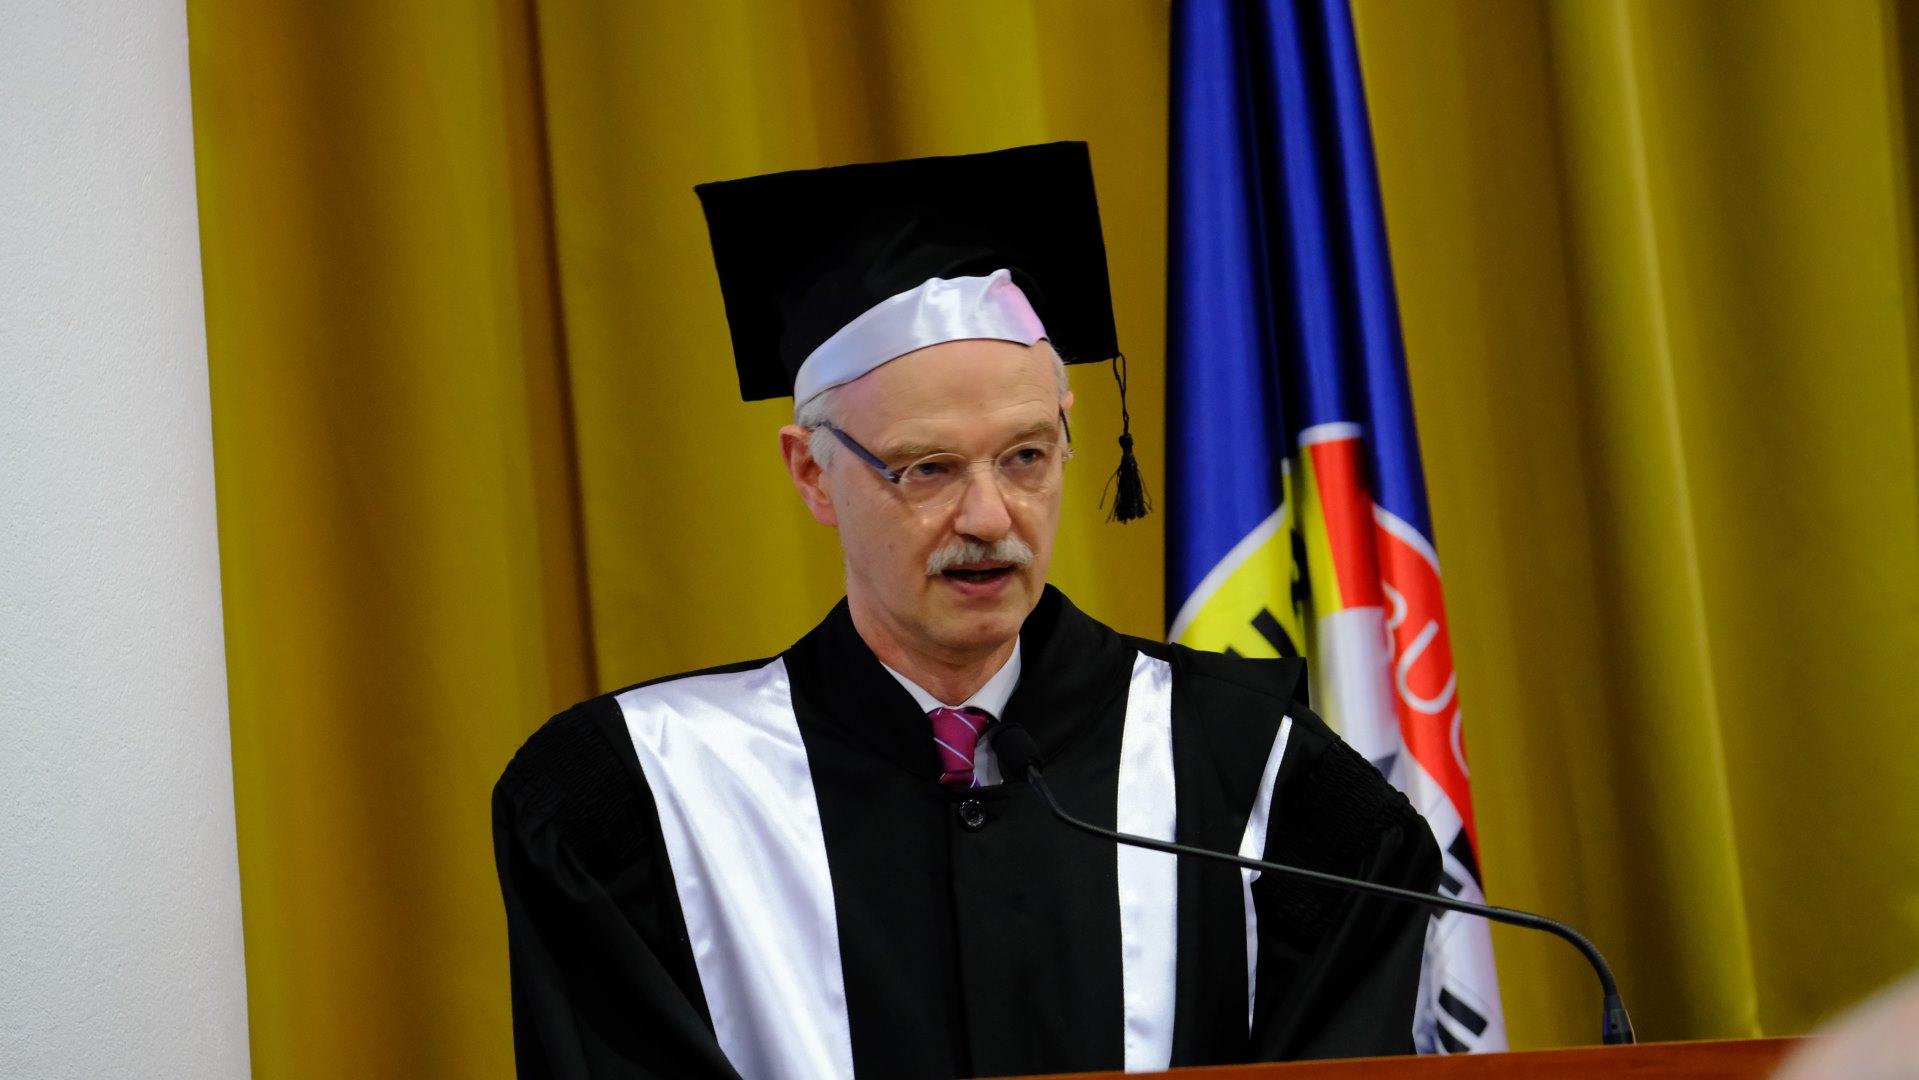 UPB a acordat titlul academic Doctor Honoris Causa domnului profesor dr. Hans Jürgen Prömel